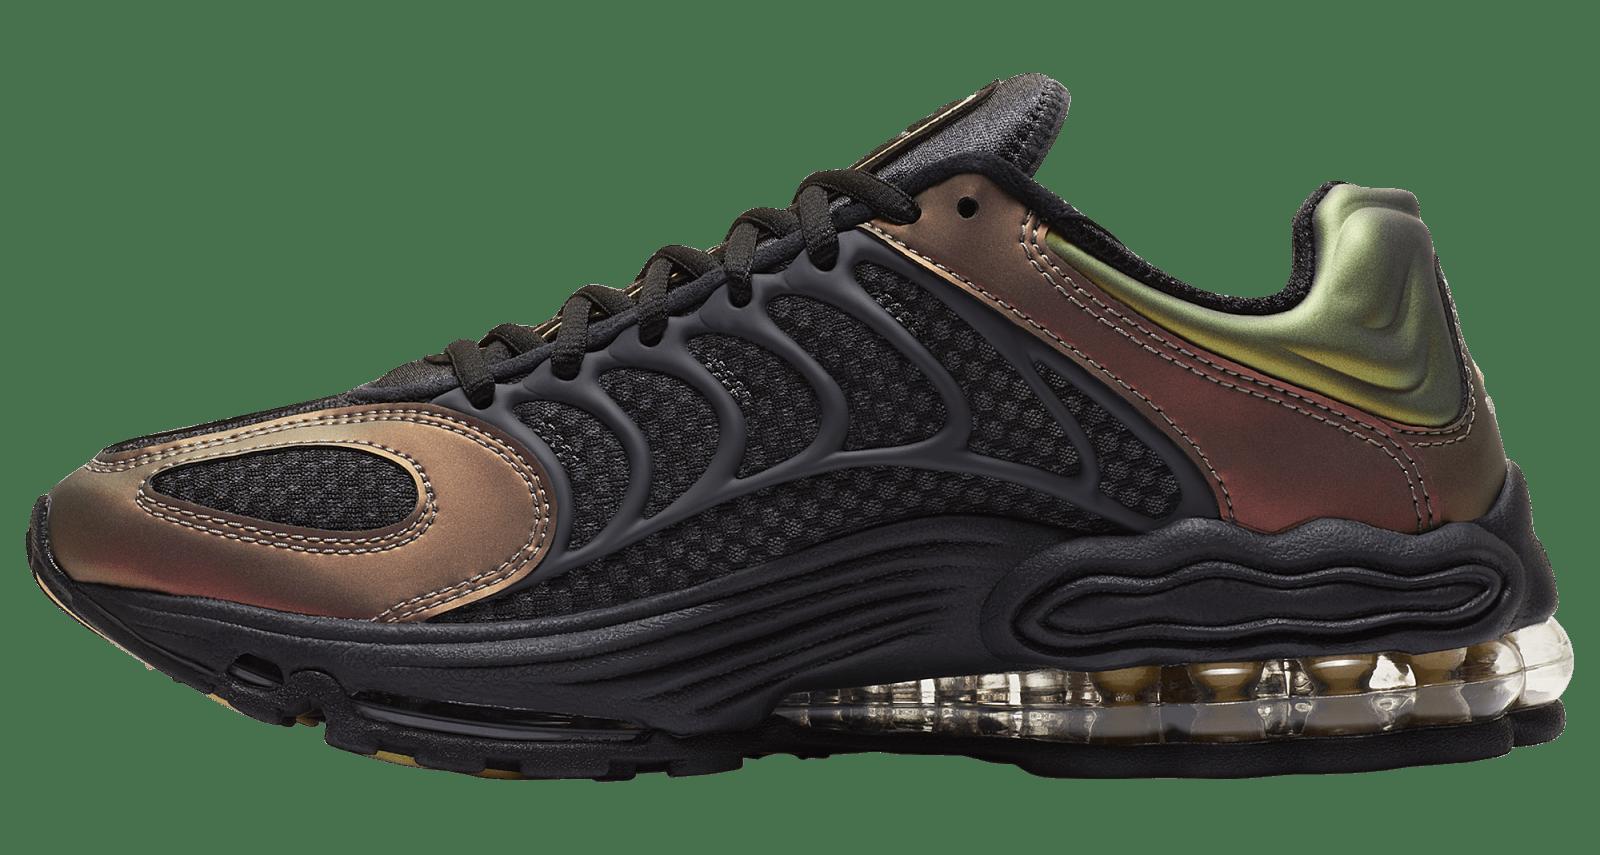 Nike Air Tuned Max Dark Charcoal/Celery/Saturn Red CV6984-001 Medial